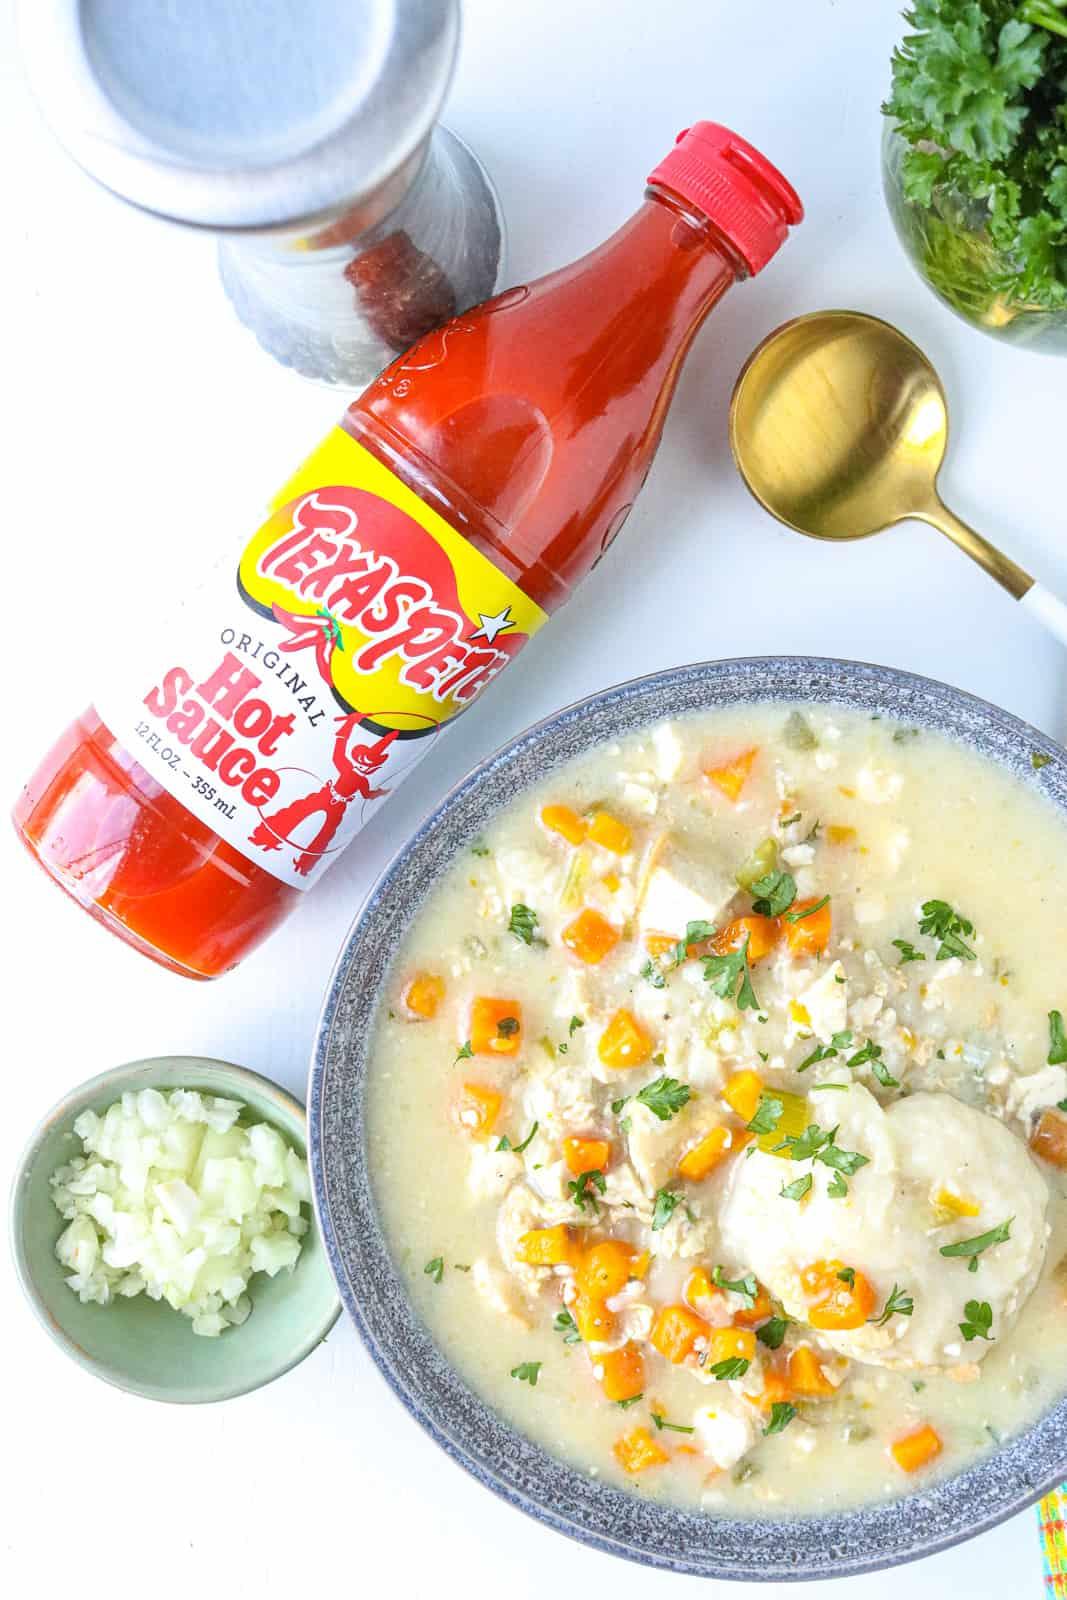 hot sauce next to chicken and dumplings soup